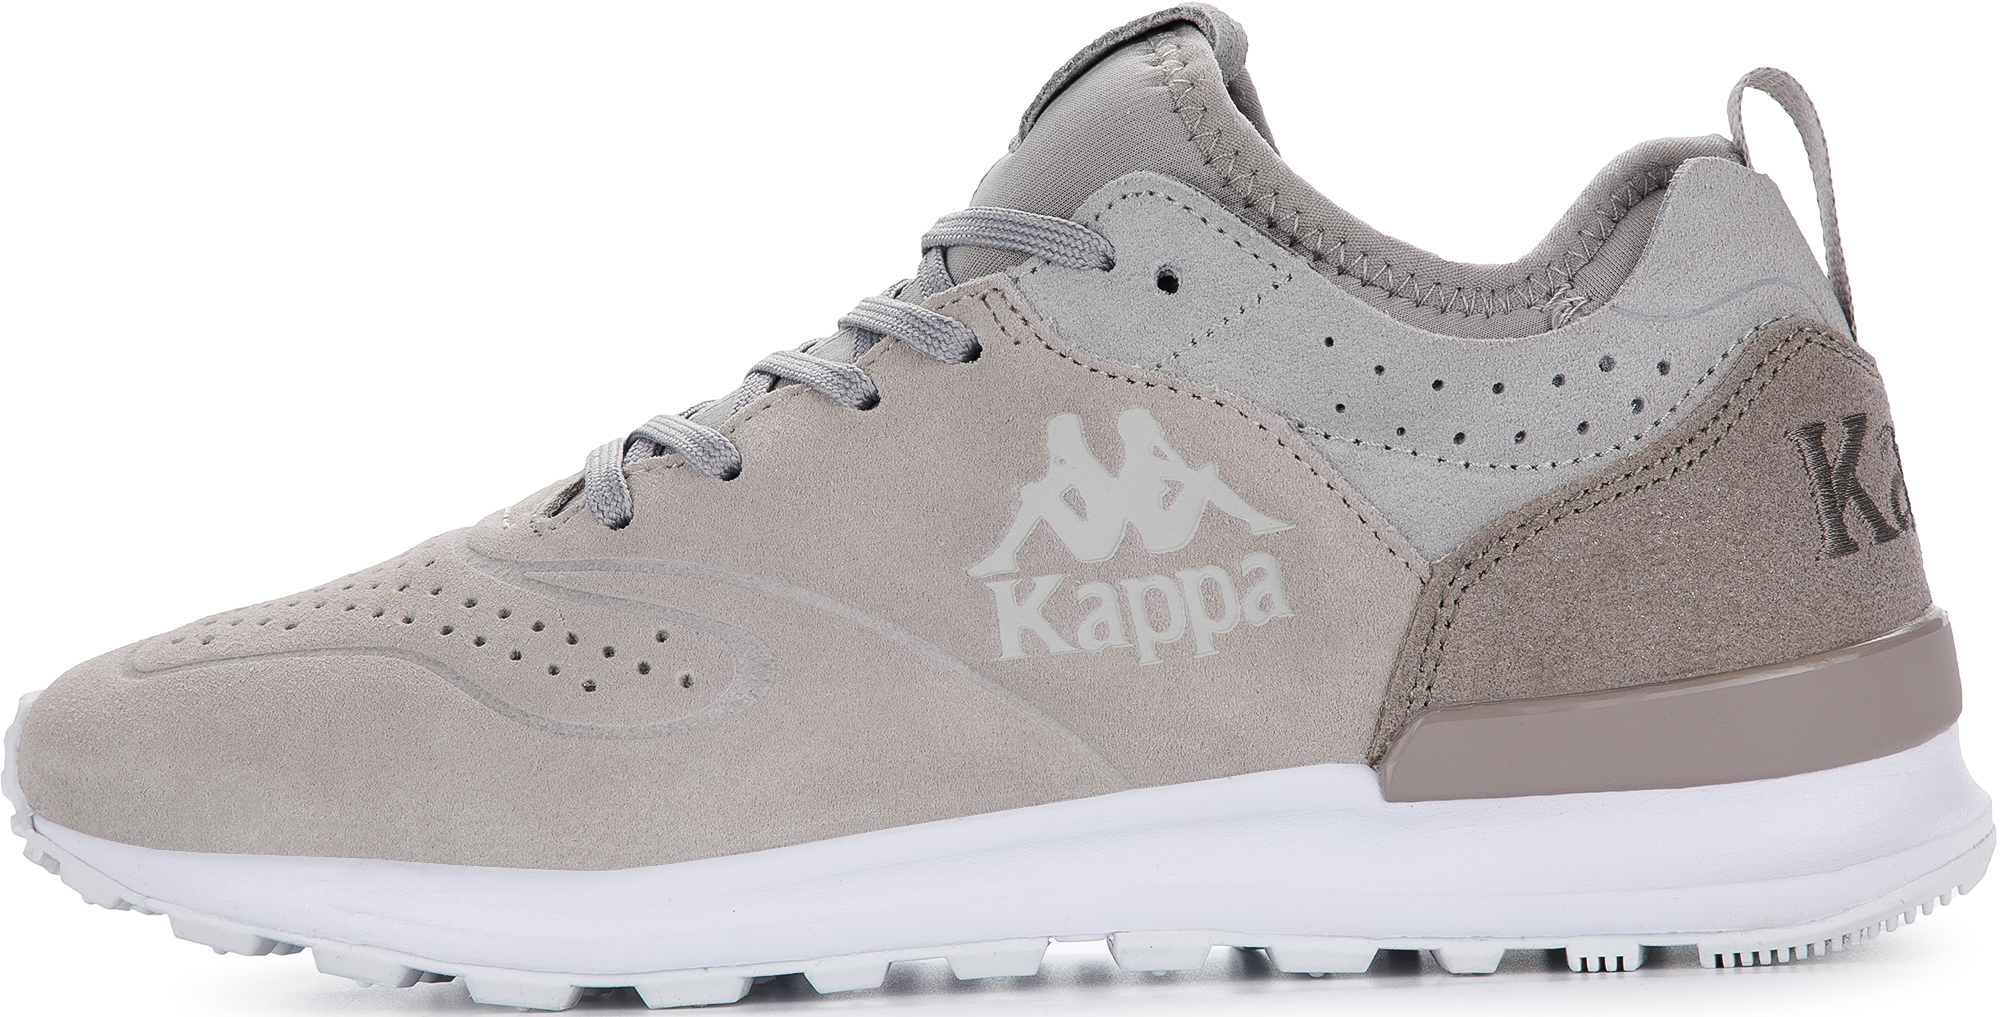 Kappa Кроссовки женские Kappa Neoclassic, размер 39 kappa кроссовки женские kappa linea